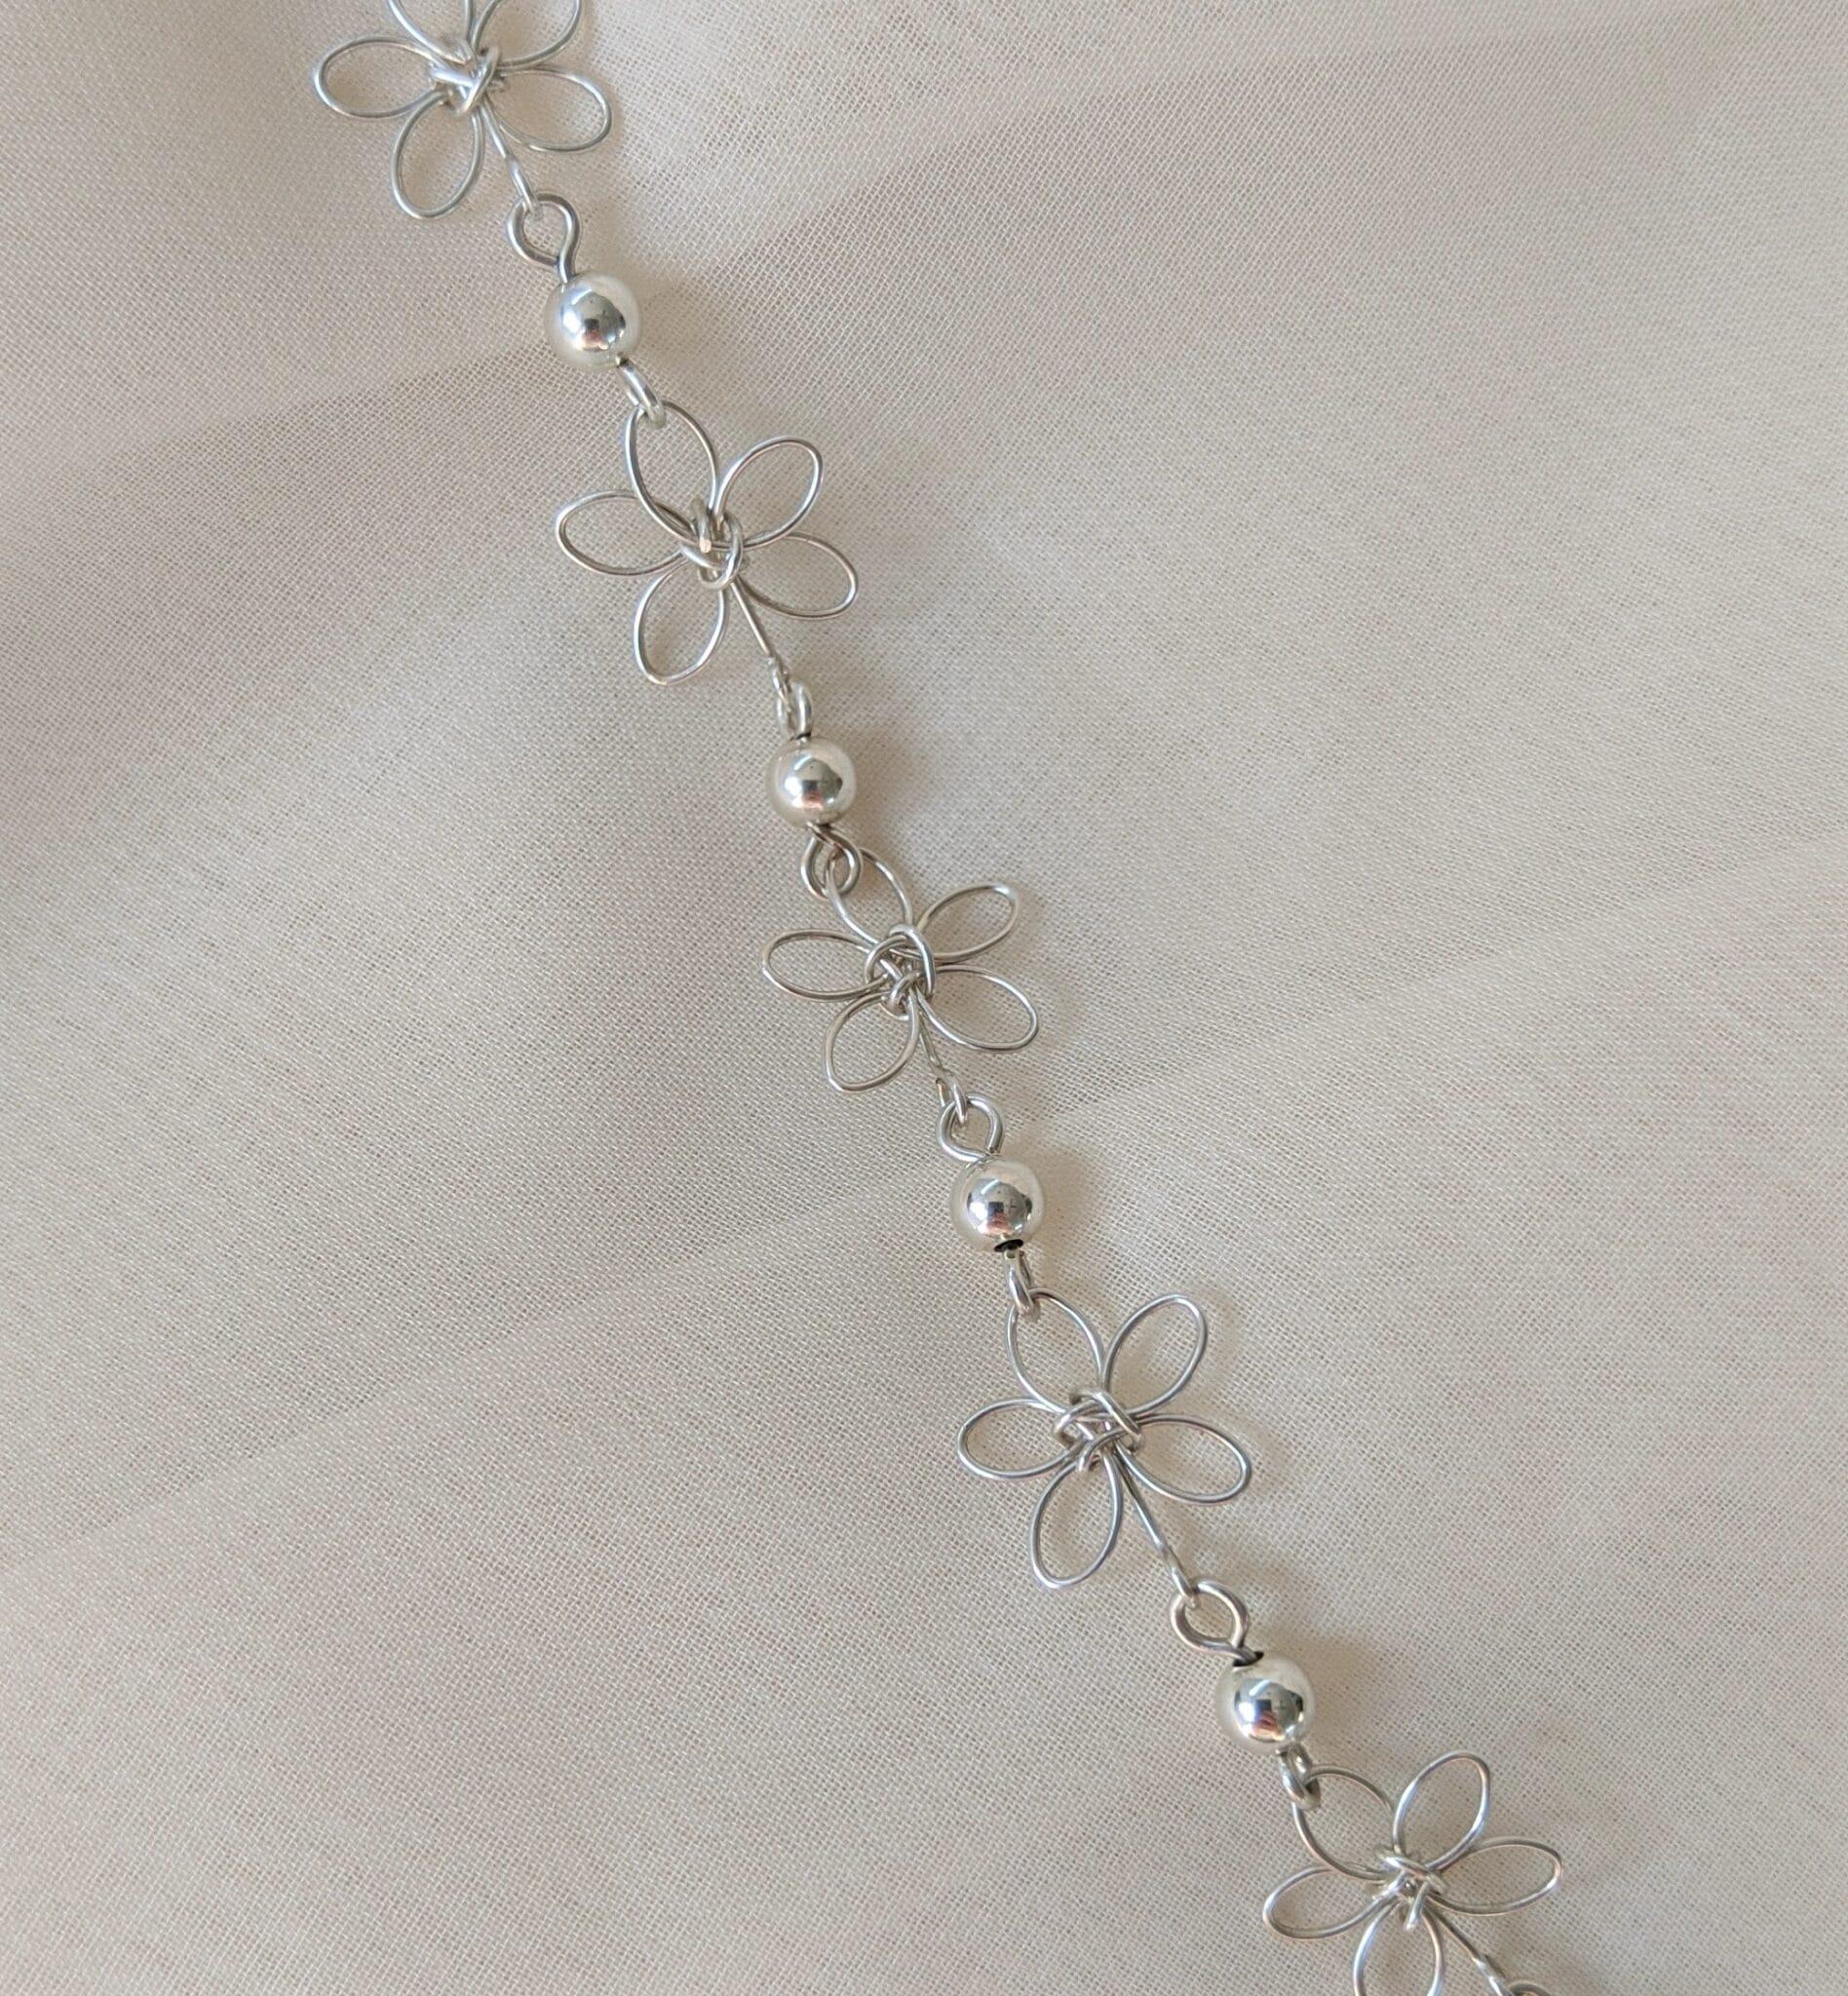 carnation-bracelet-sterling-silver-by-little-hangings-prahran-by-littlehangings